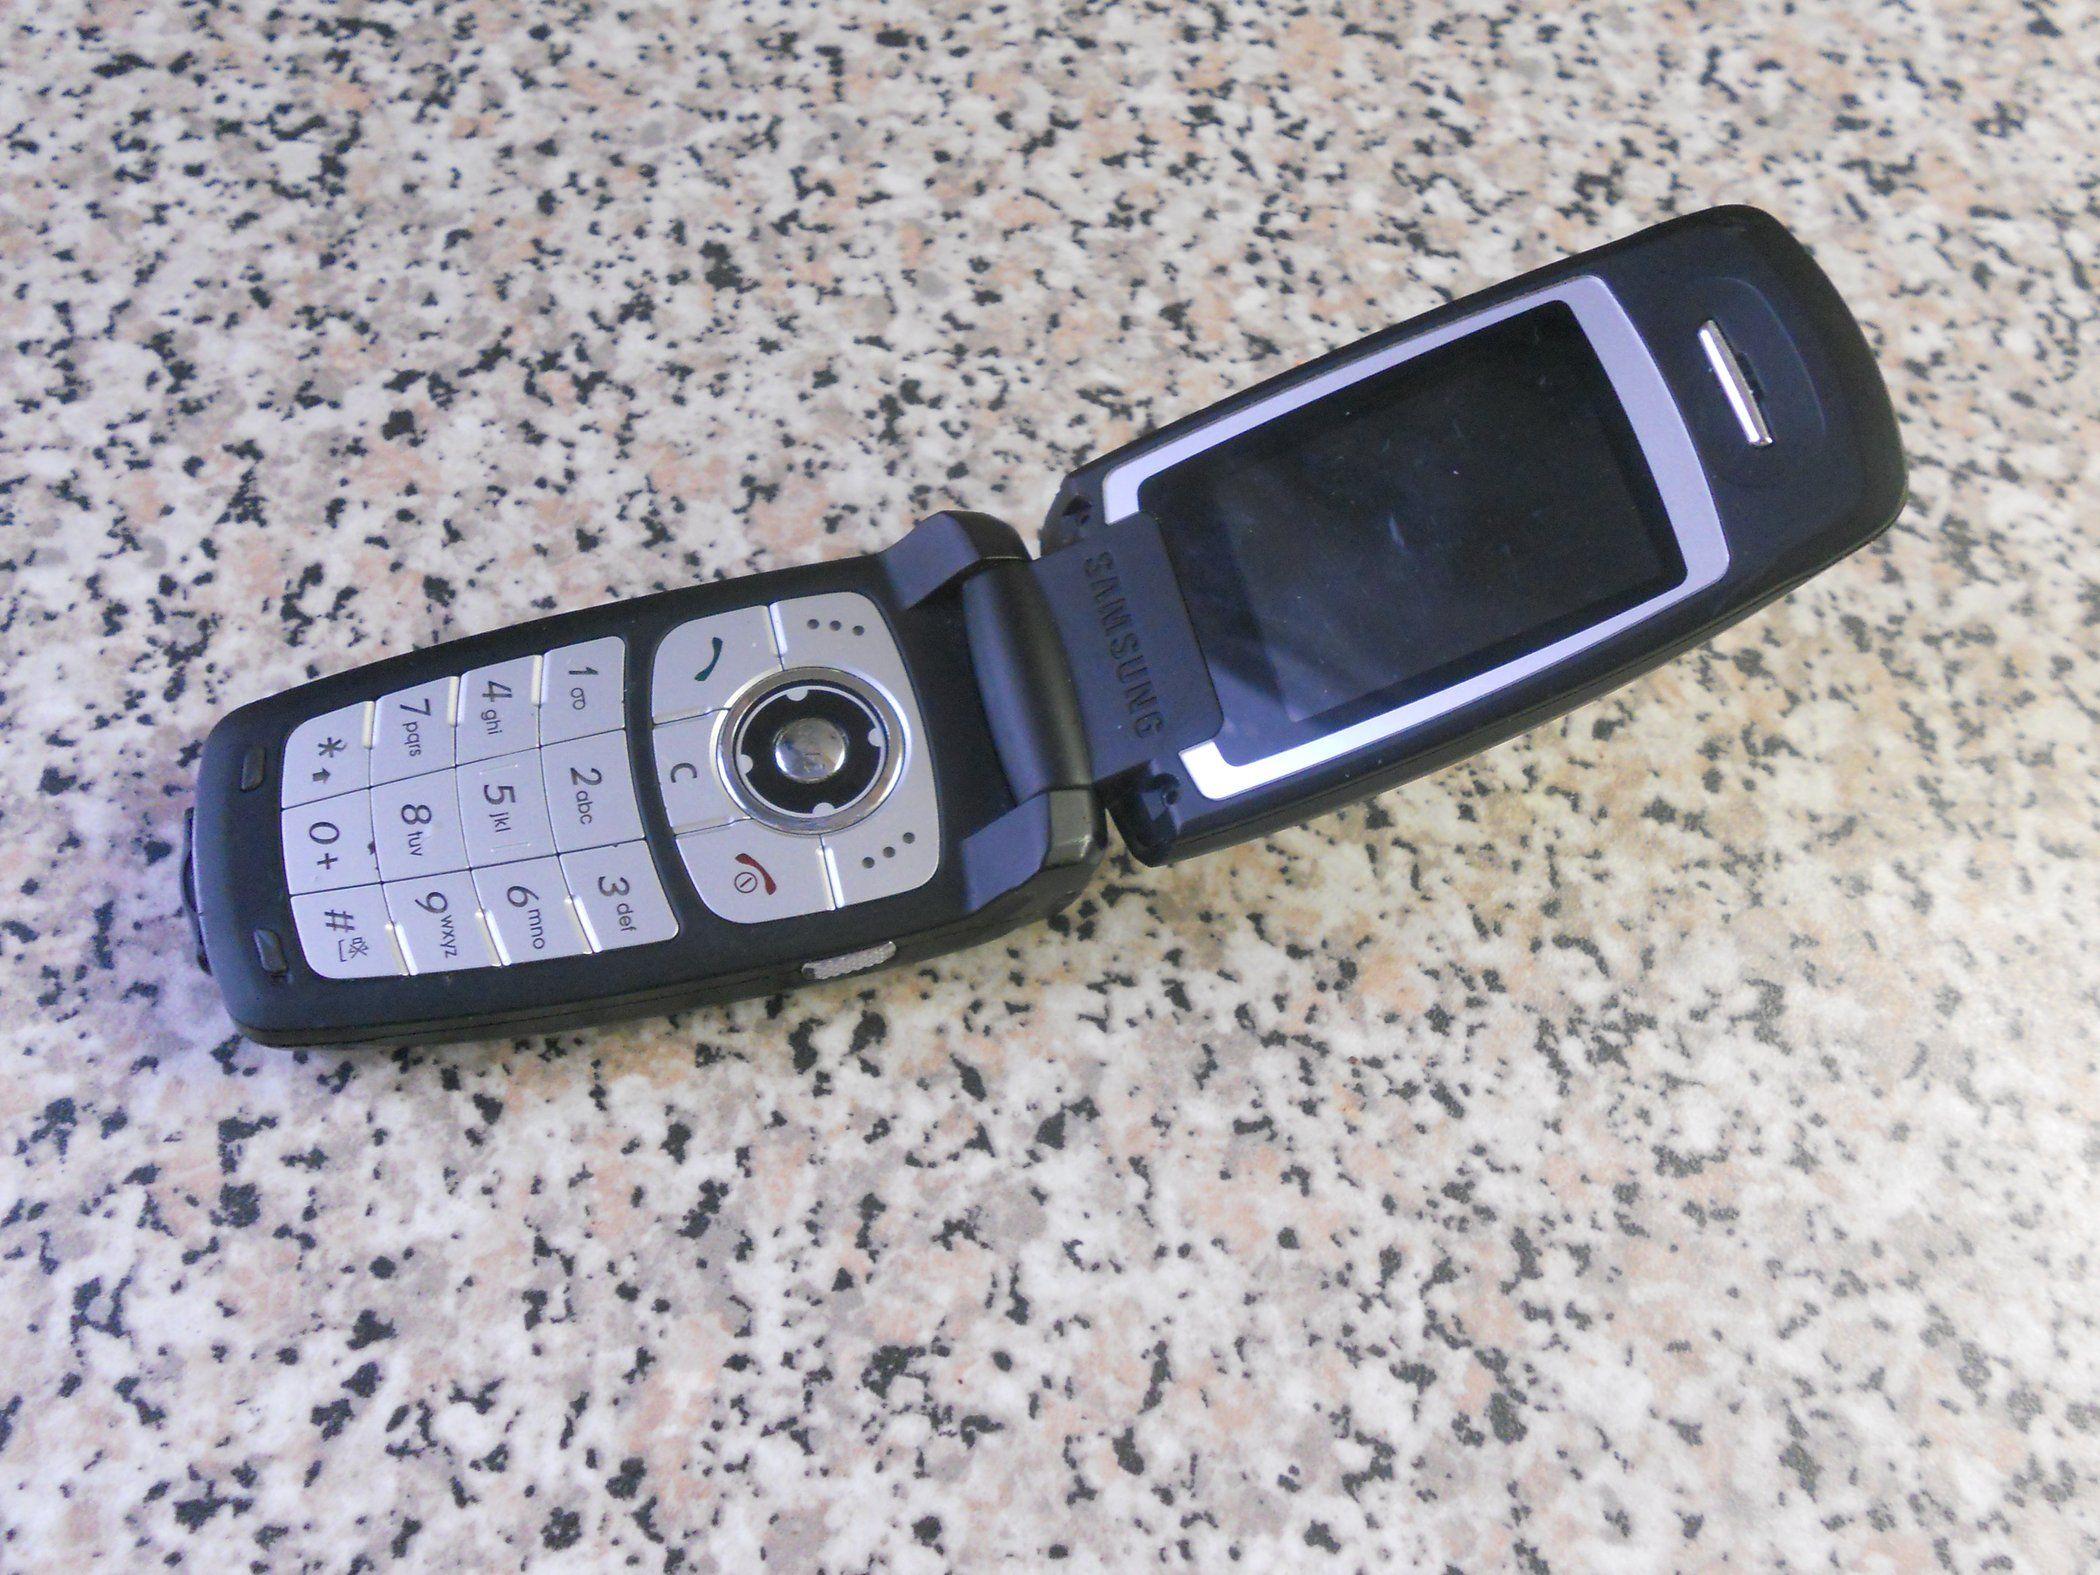 Diy spy phone spy gear spy gadgets diy flip phones